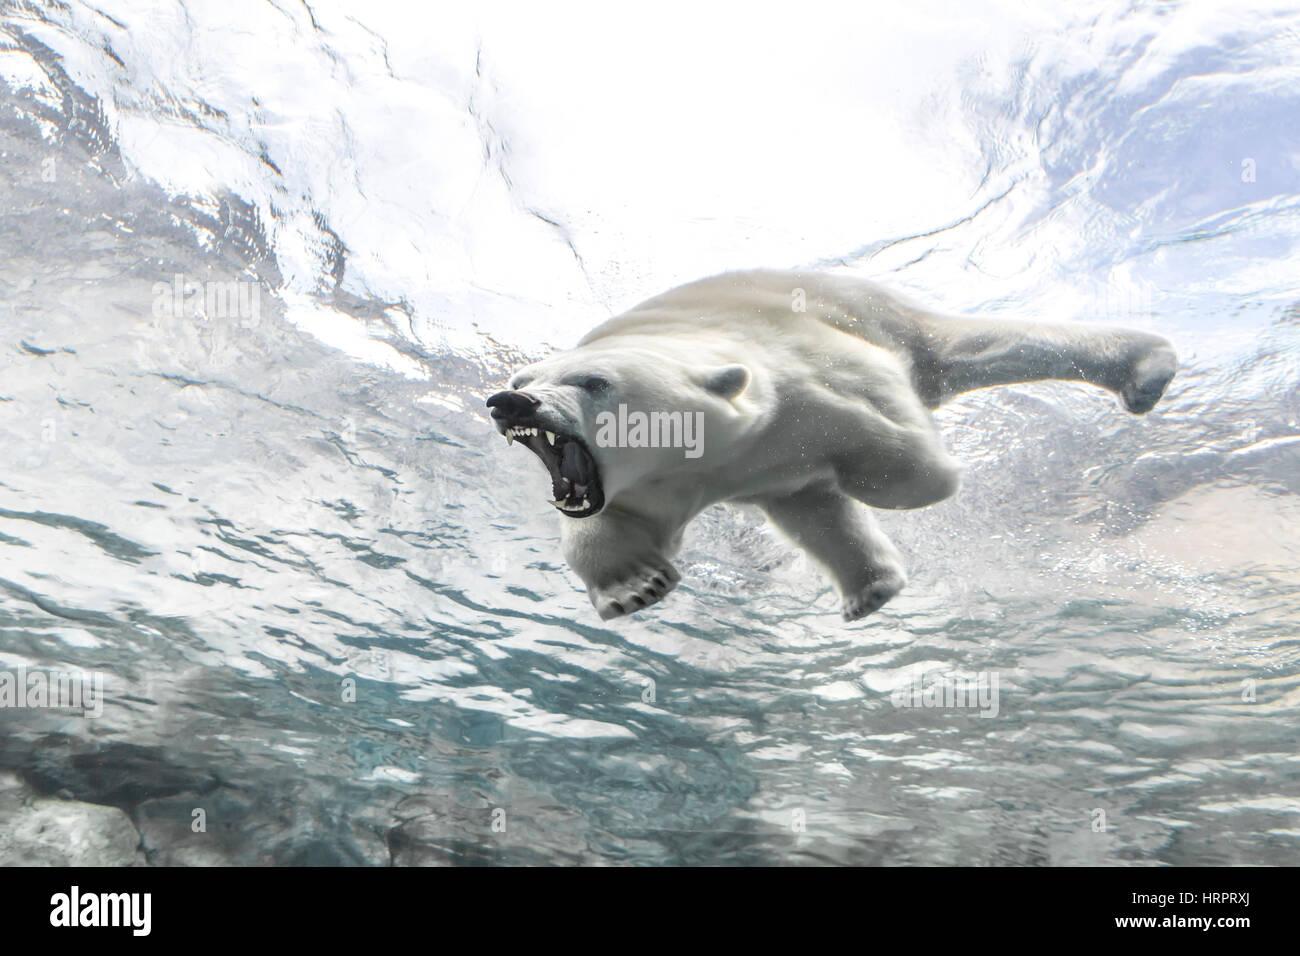 L'ours agressifs au voyage à Churchill, Zoo du Parc Assiniboine, Winnipeg, Manitoba, Canada. Photo Stock